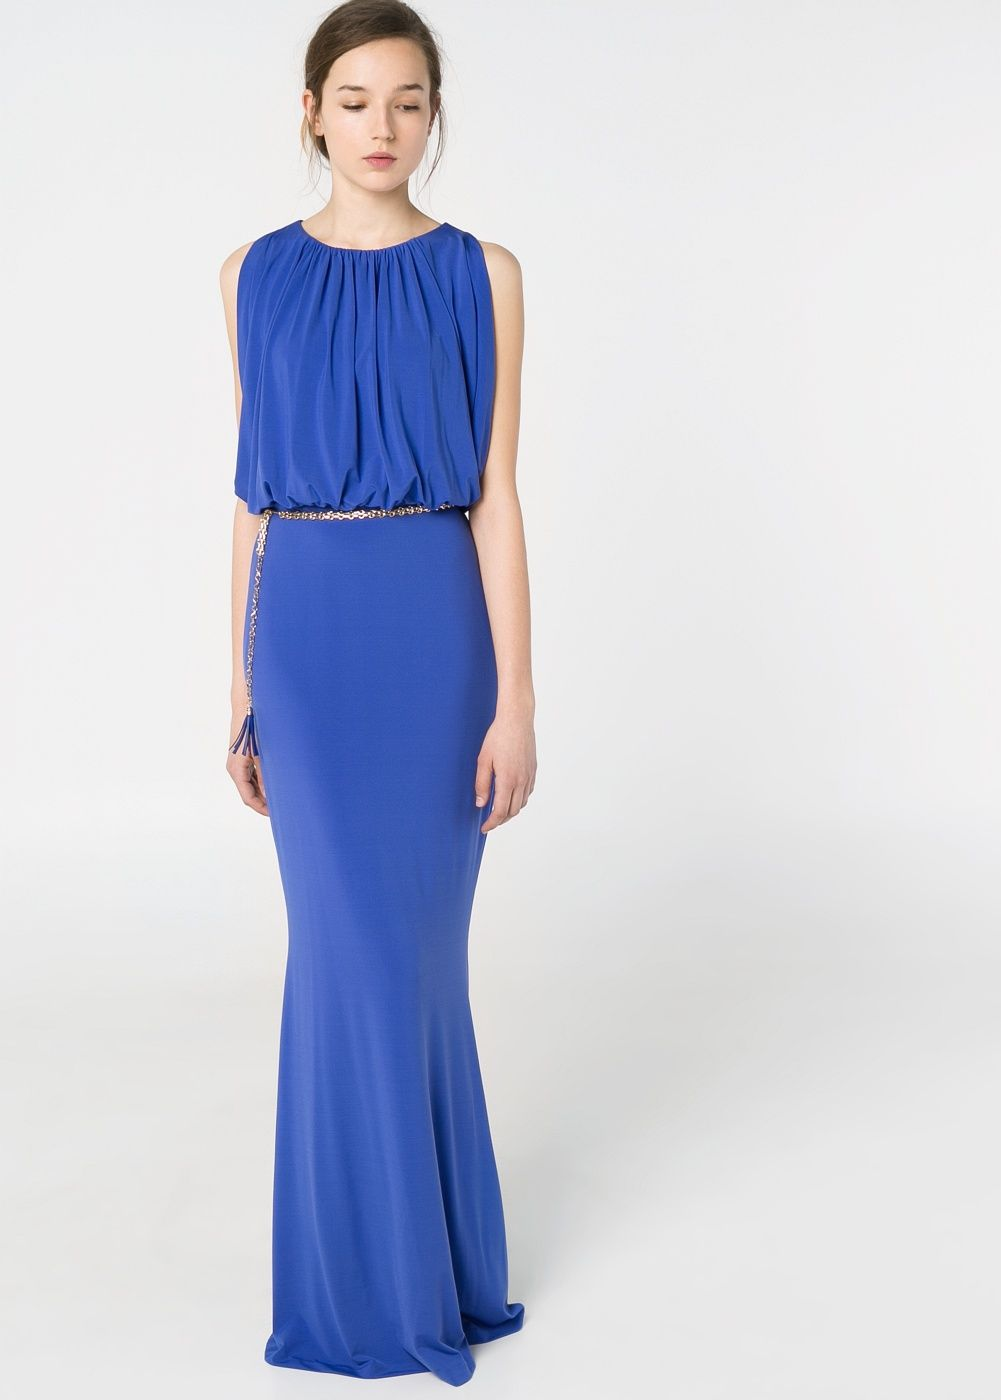 569c4b1d7d Long dress from Mango Vestidos De Fiesta Economicos